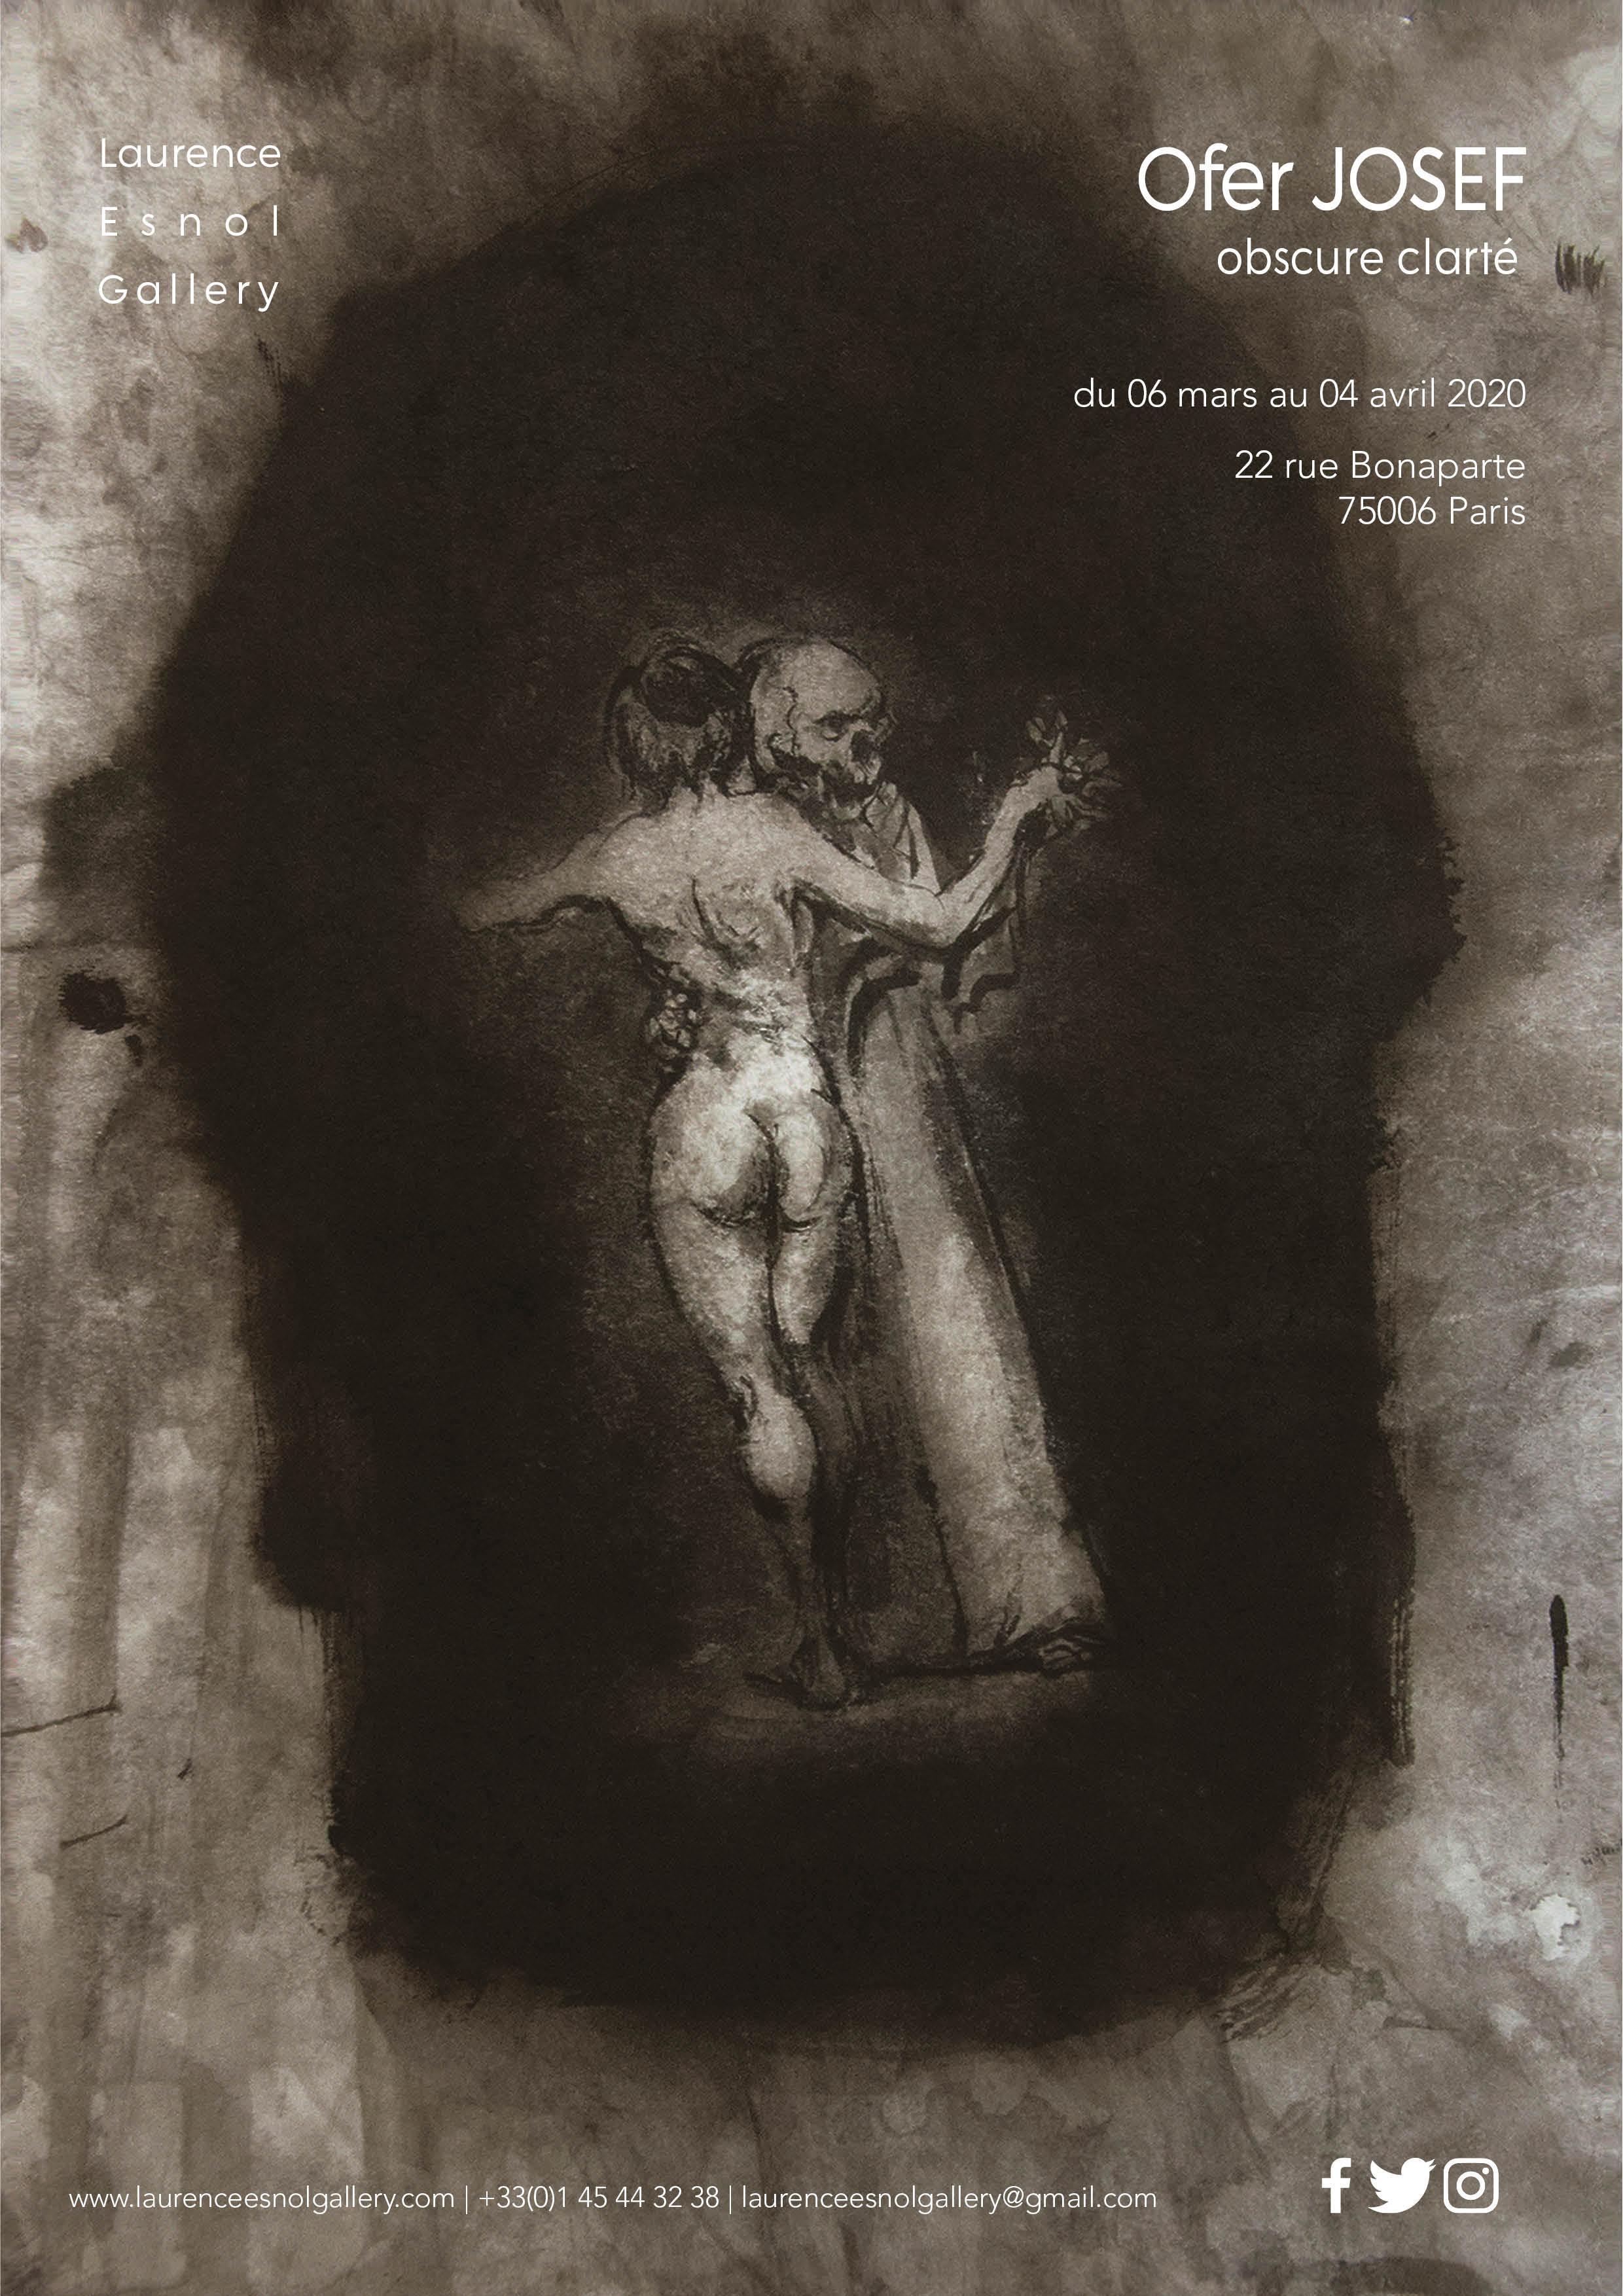 Ofer JOSEF - obscur clarté